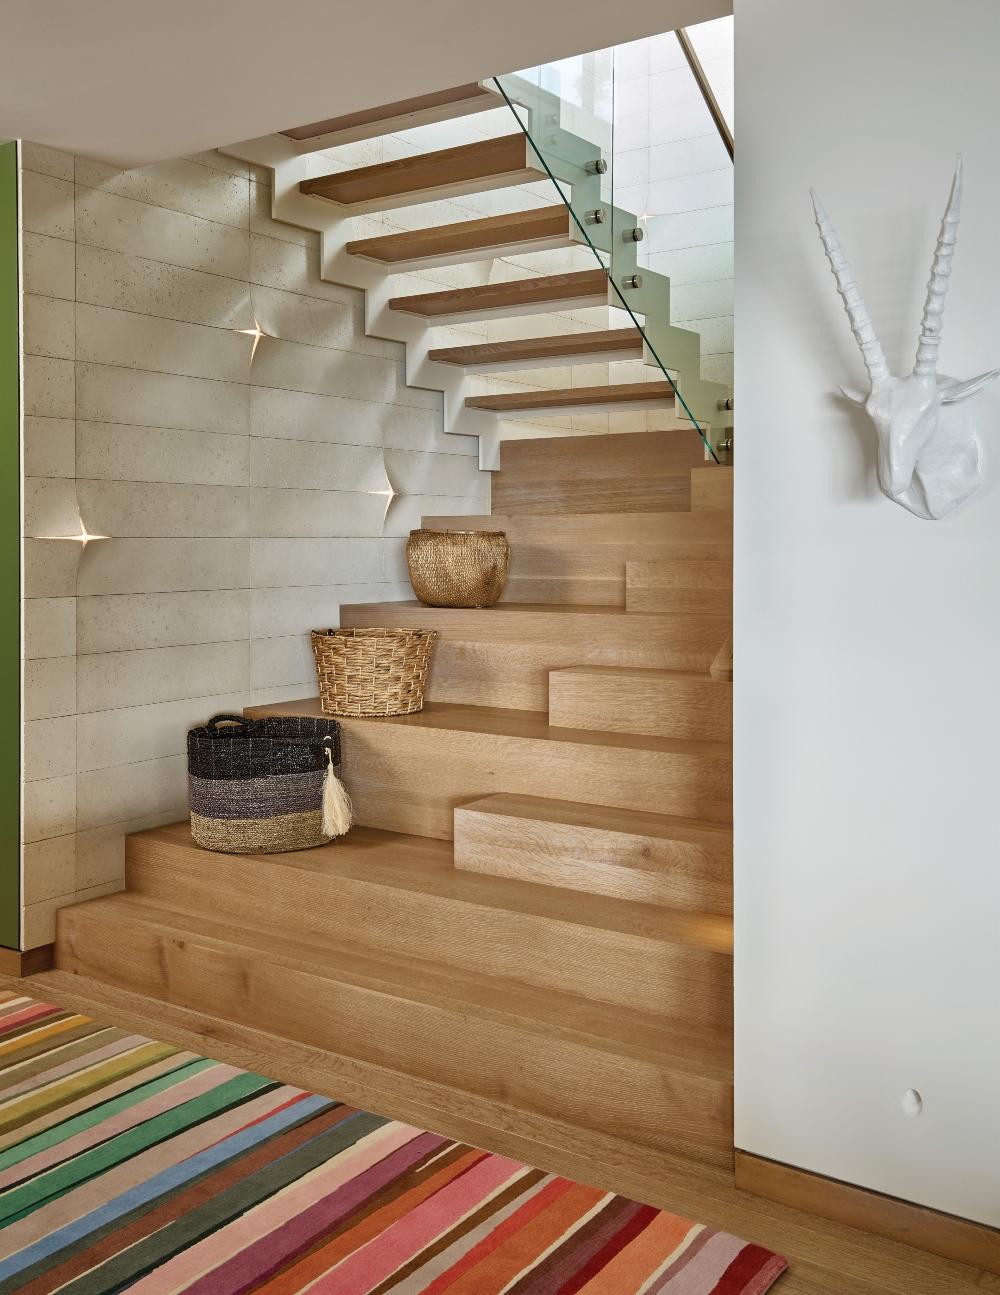 Webb Beck Arnold Avon 09 26 19 Lower Level Stair 130mb